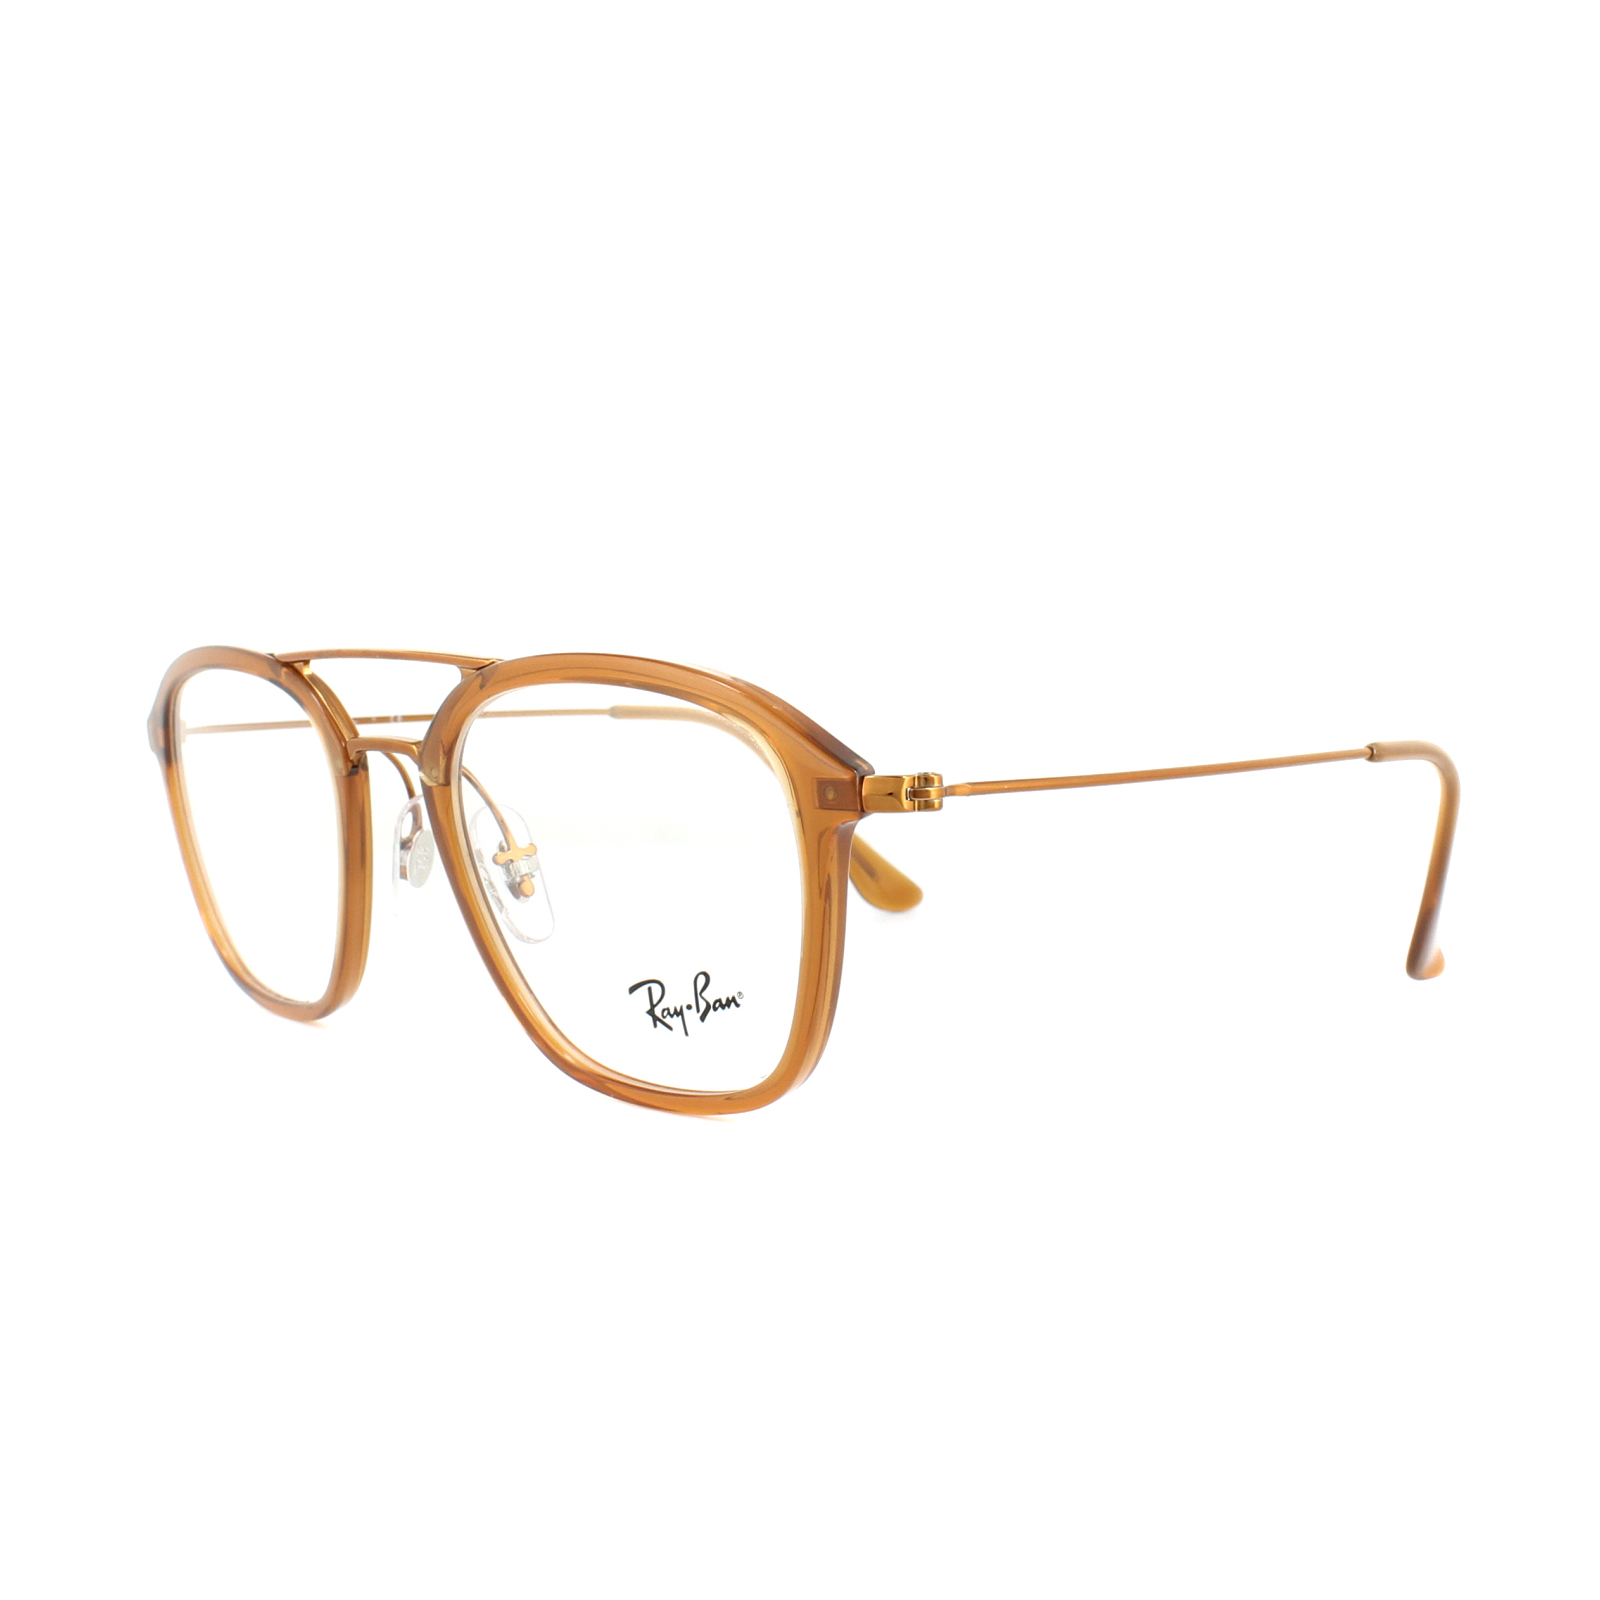 b68417e7ca Cheap Ray-Ban RX 7098 Glasses Frames - Discounted Sunglasses